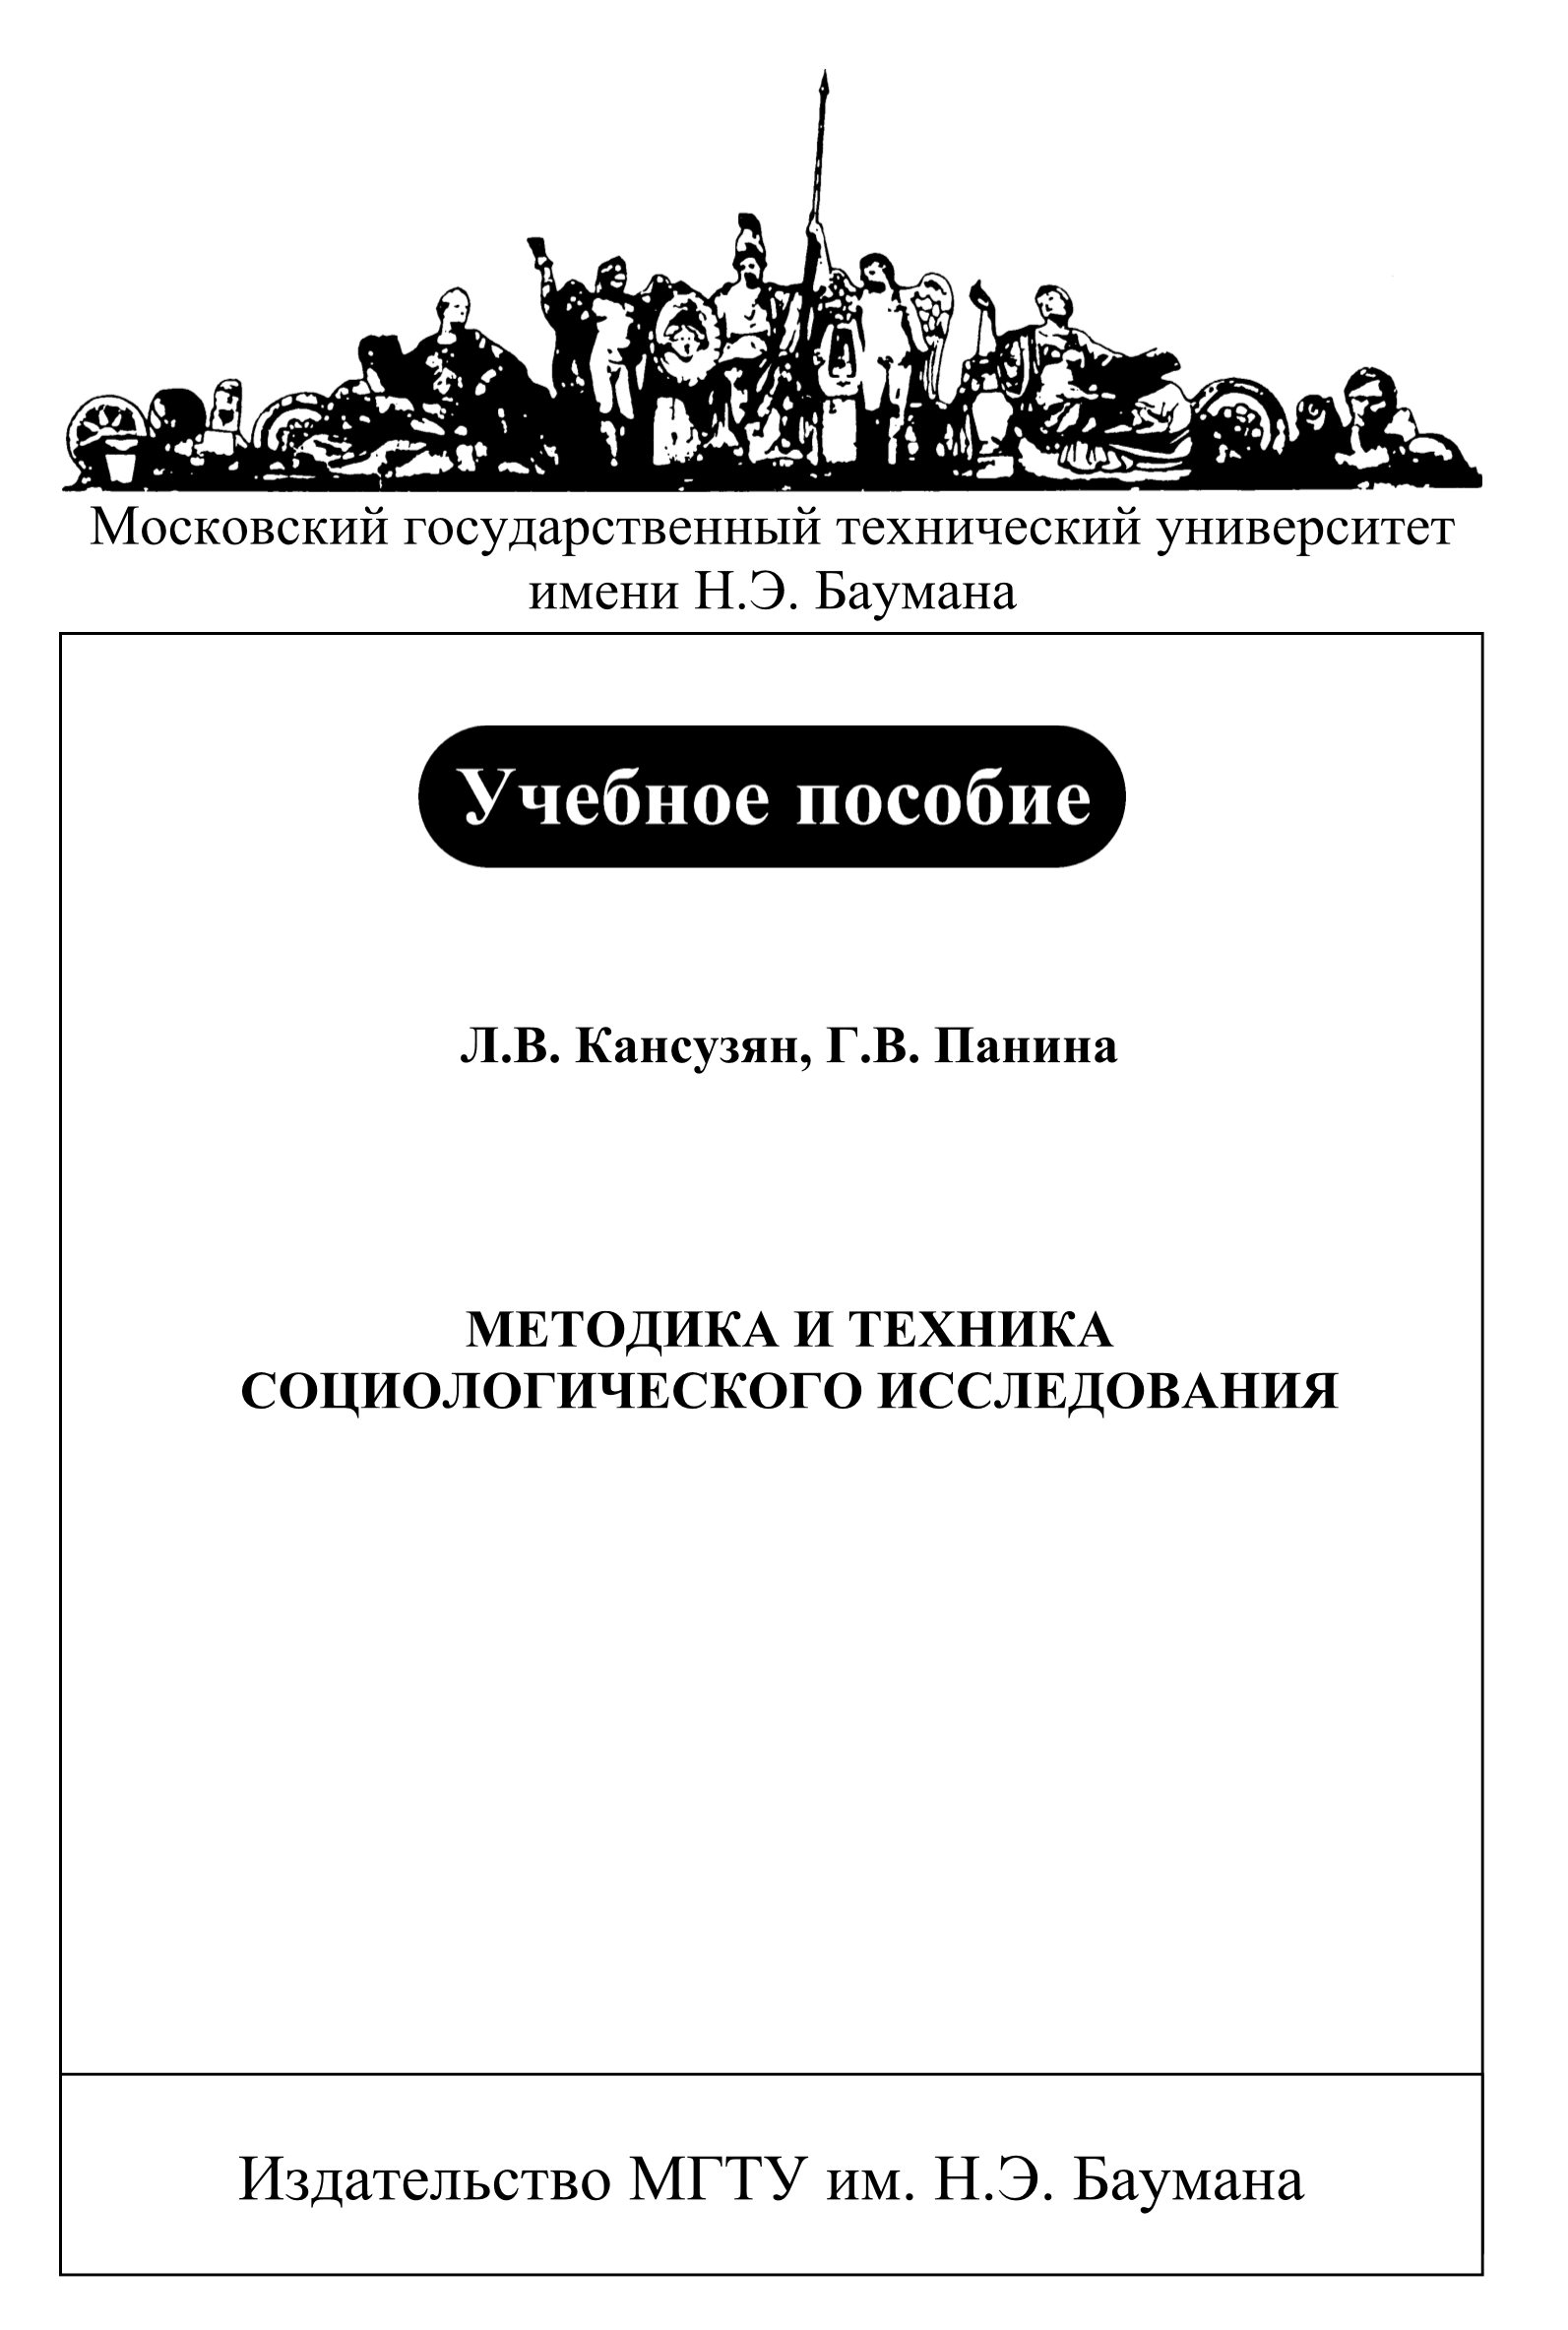 Методика и техника социологического исследования